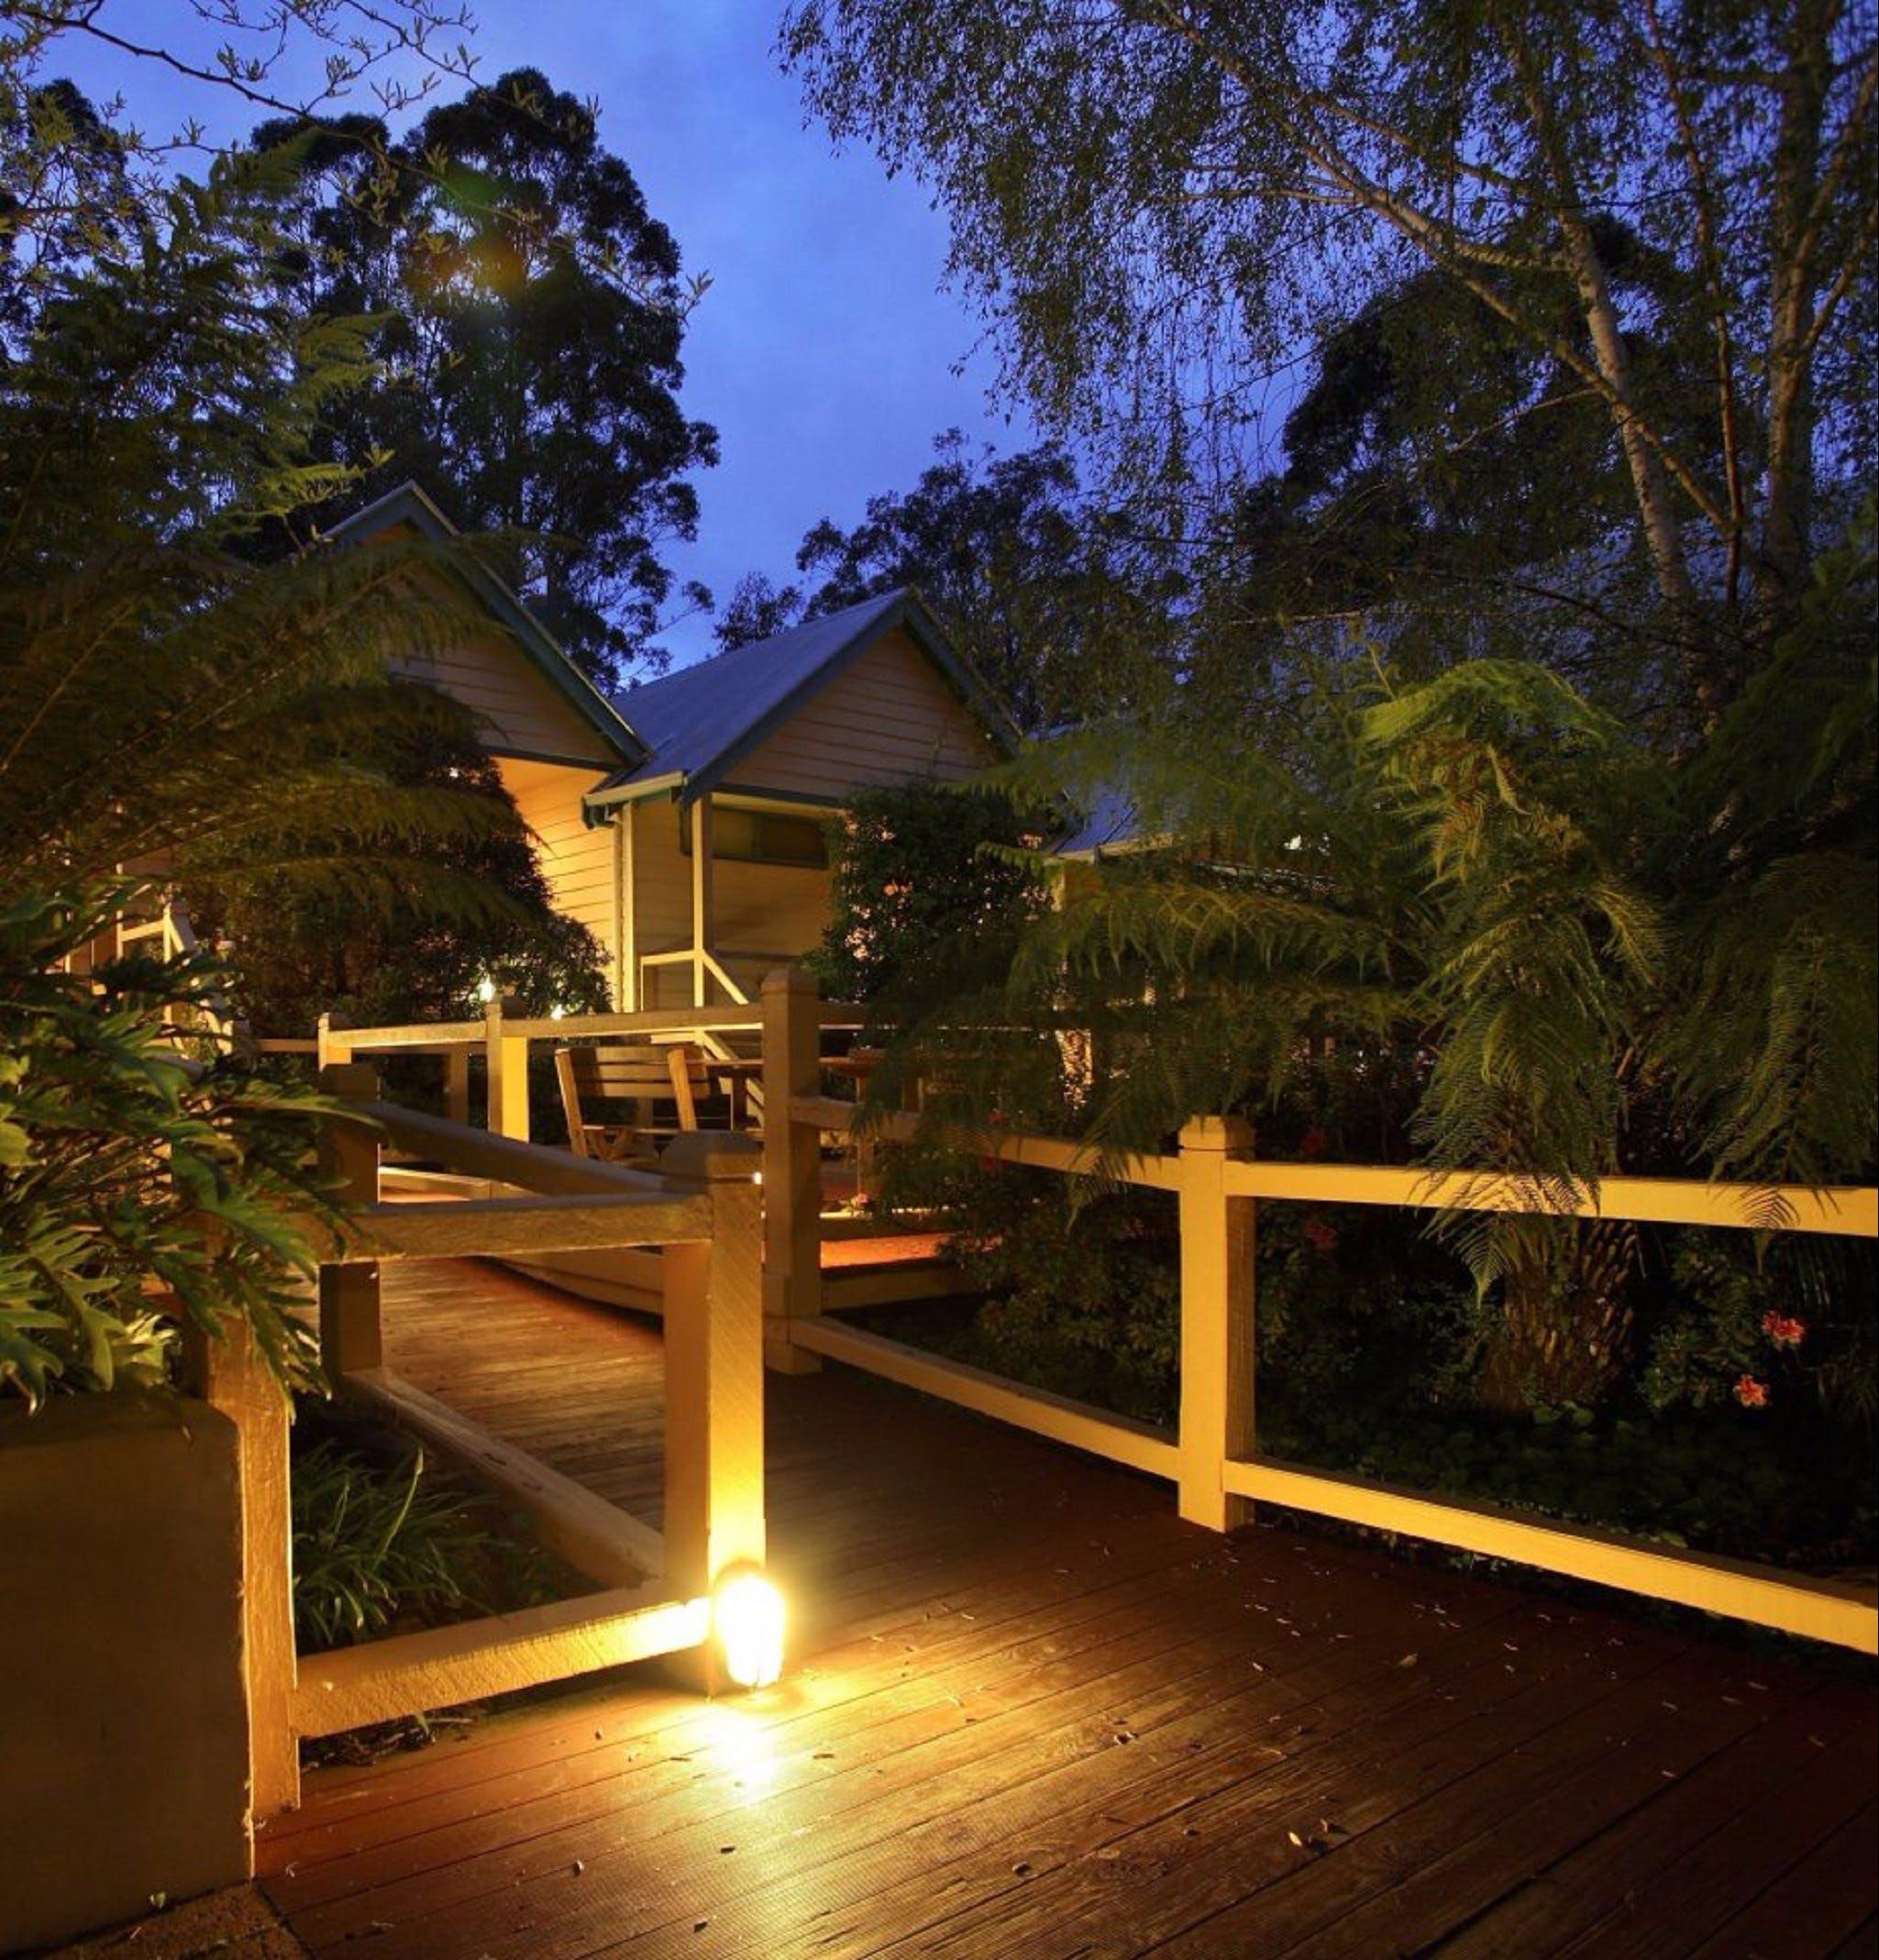 Heritage Trail Lodge, Margaret River, Western Australia